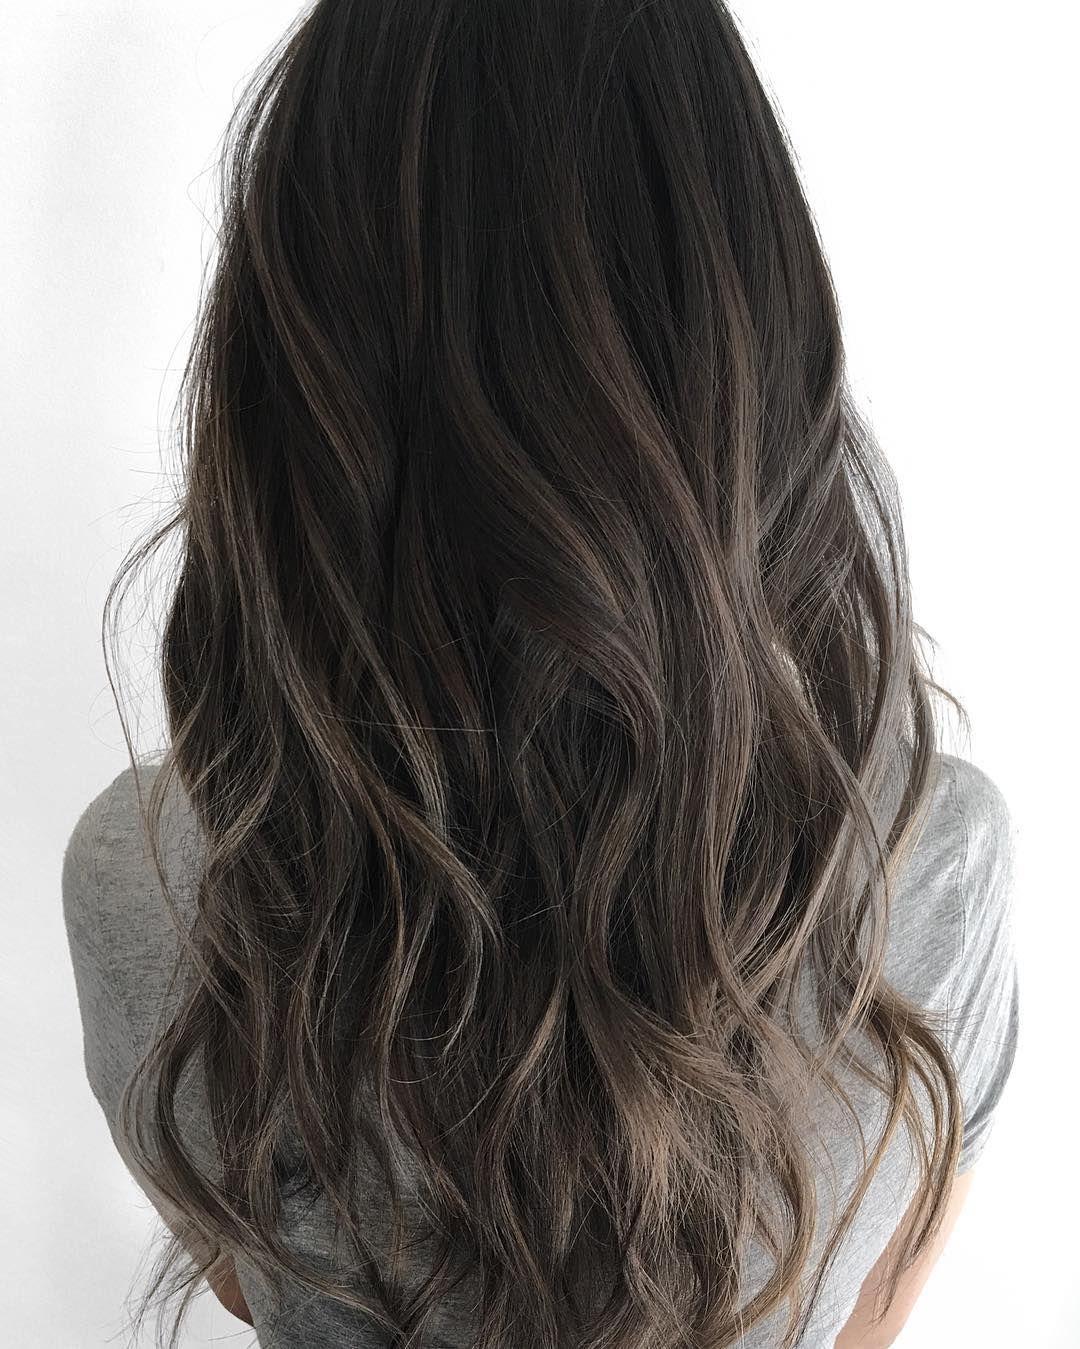 Hair おしゃれまとめの人気アイデア Pinterest Asaki ヘア